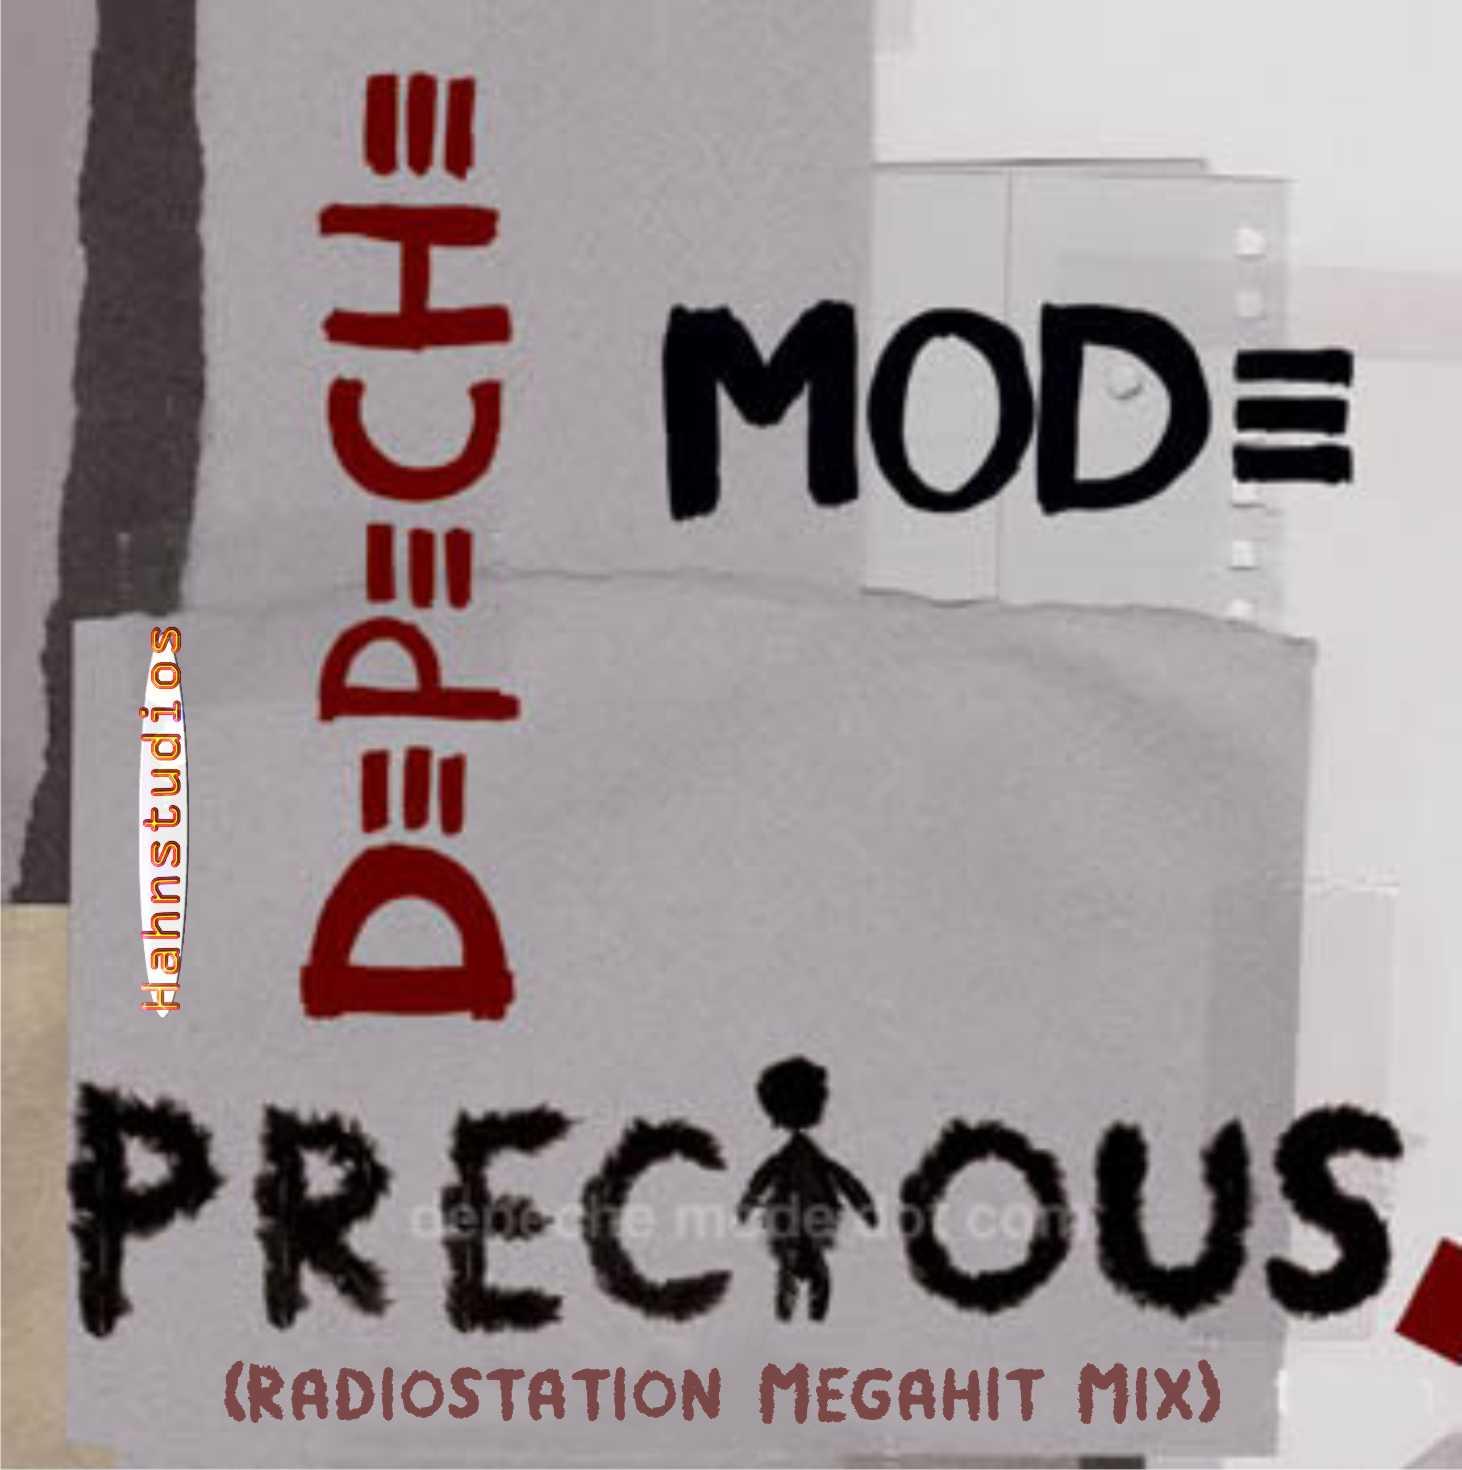 [Depeche+Mode+cover+www.jpg]